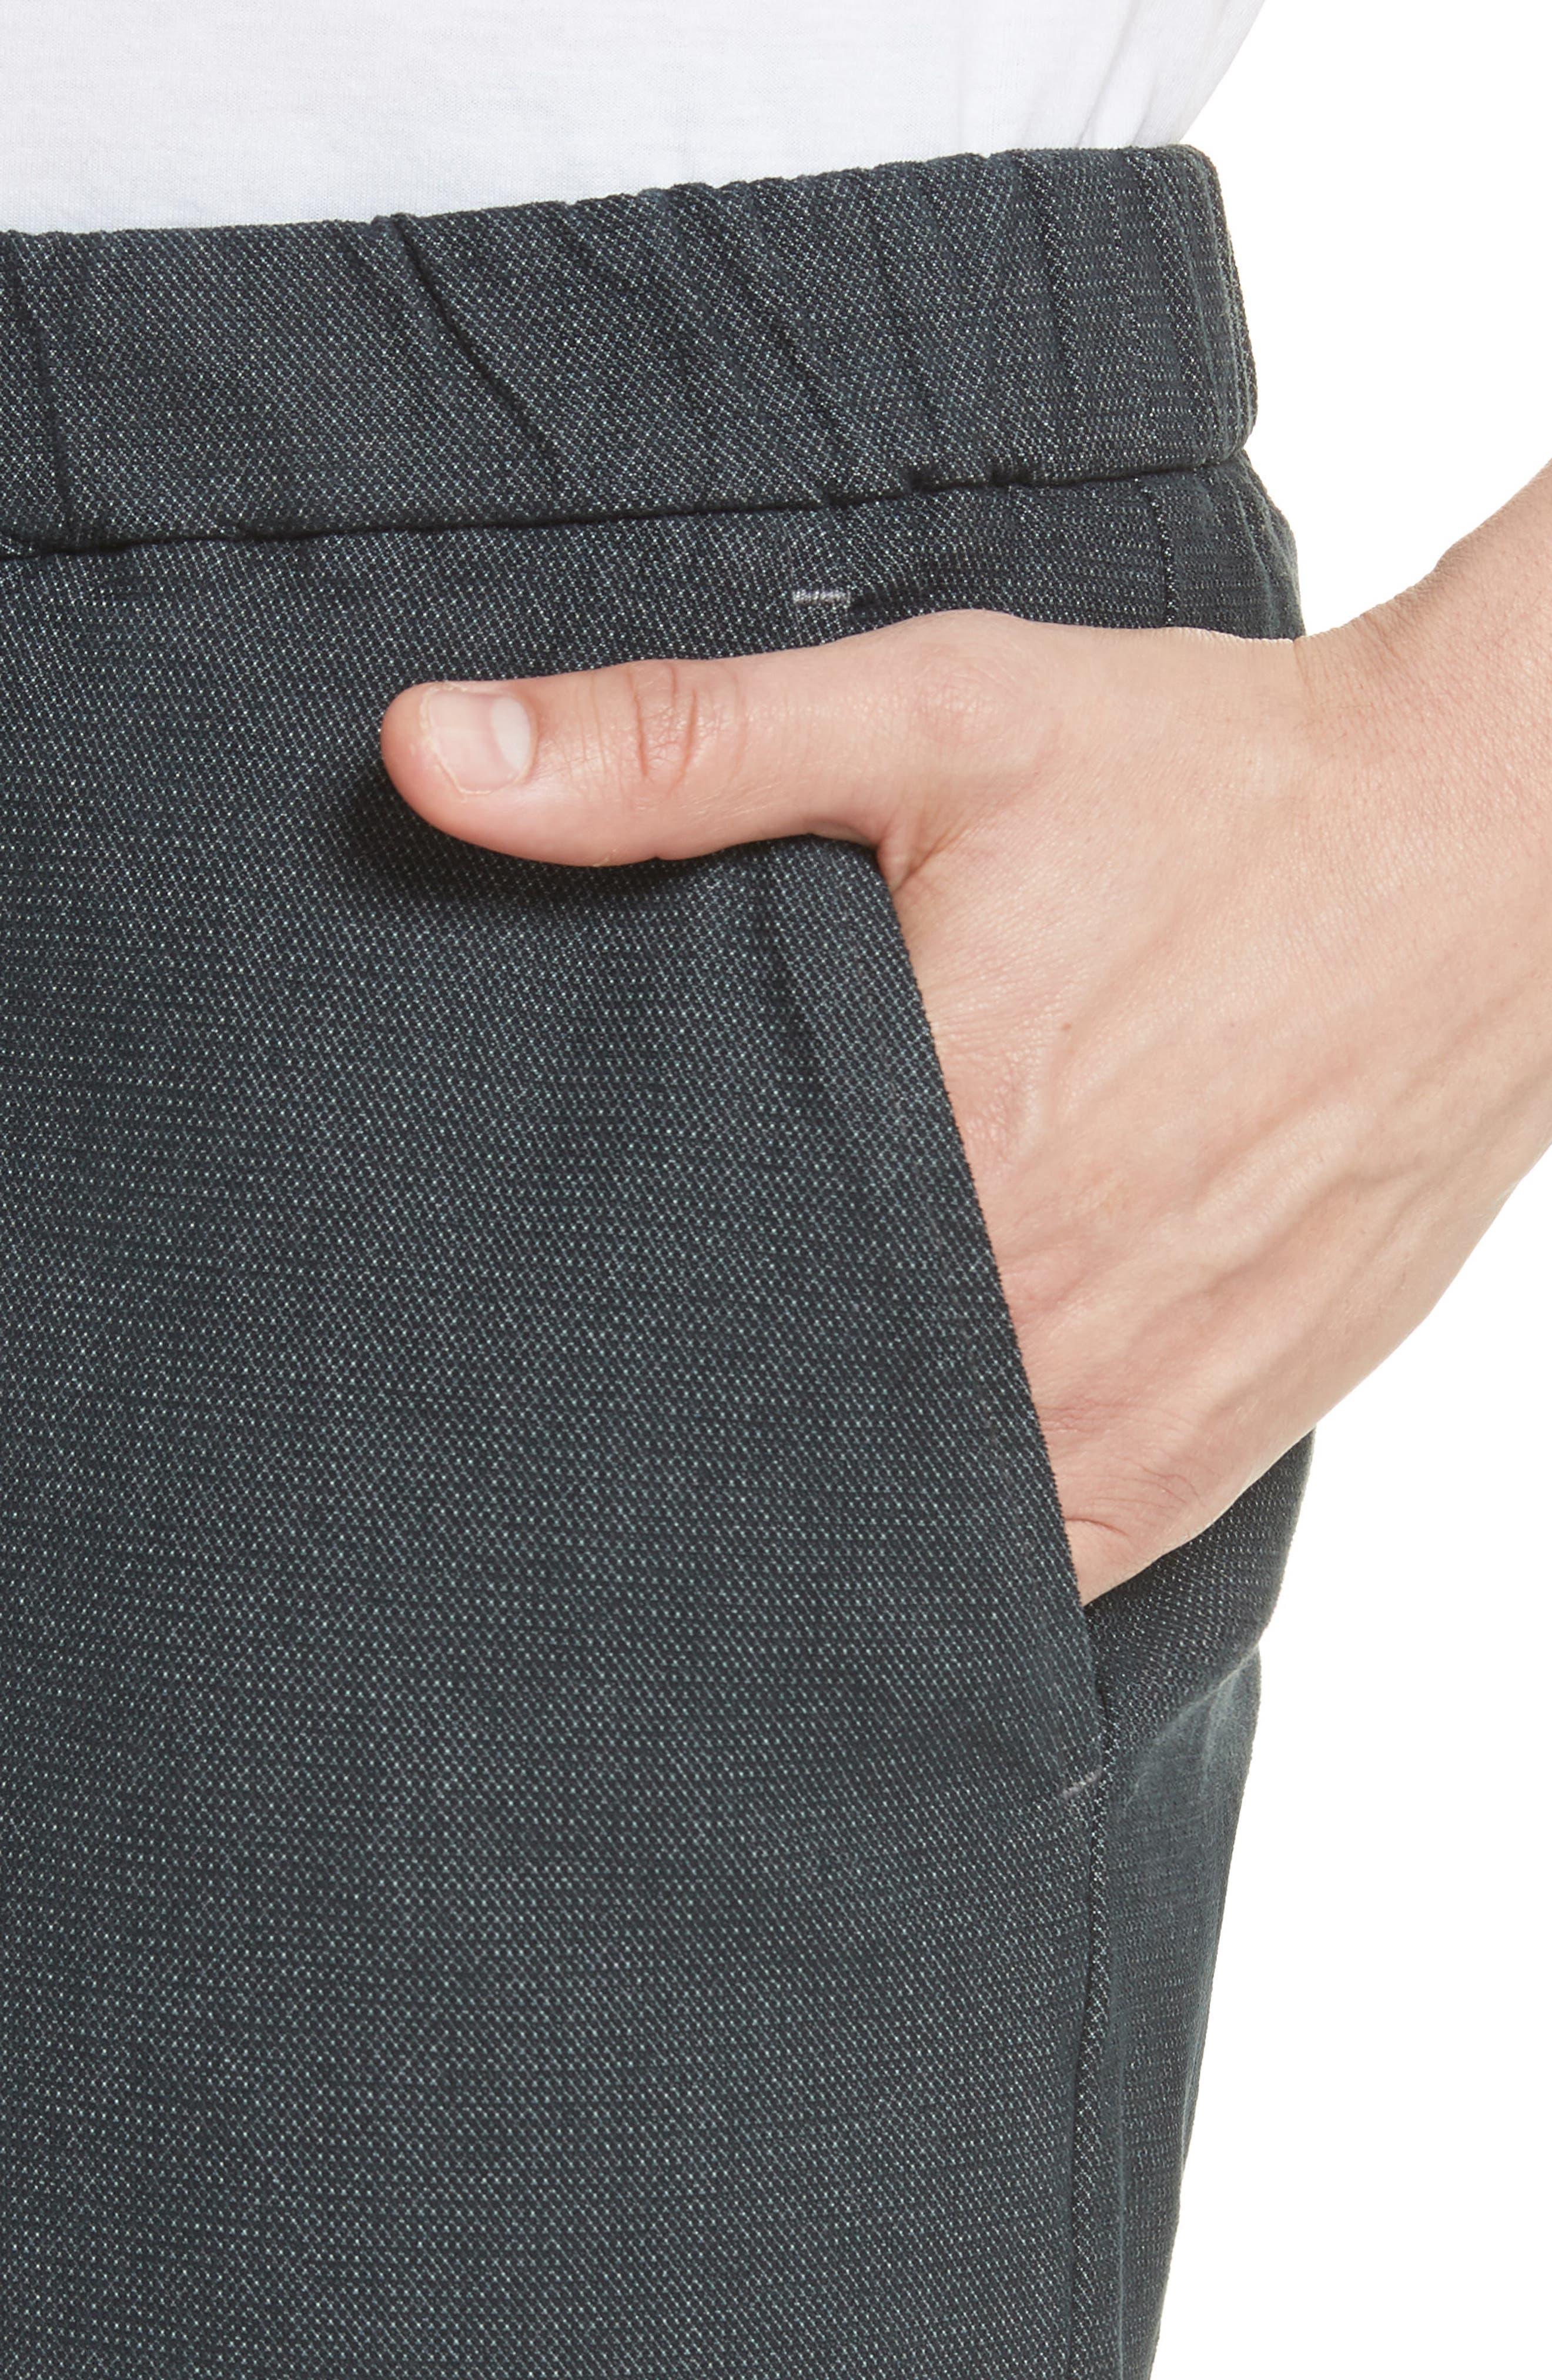 Aregna Ponto Trousers,                             Alternate thumbnail 4, color,                             020